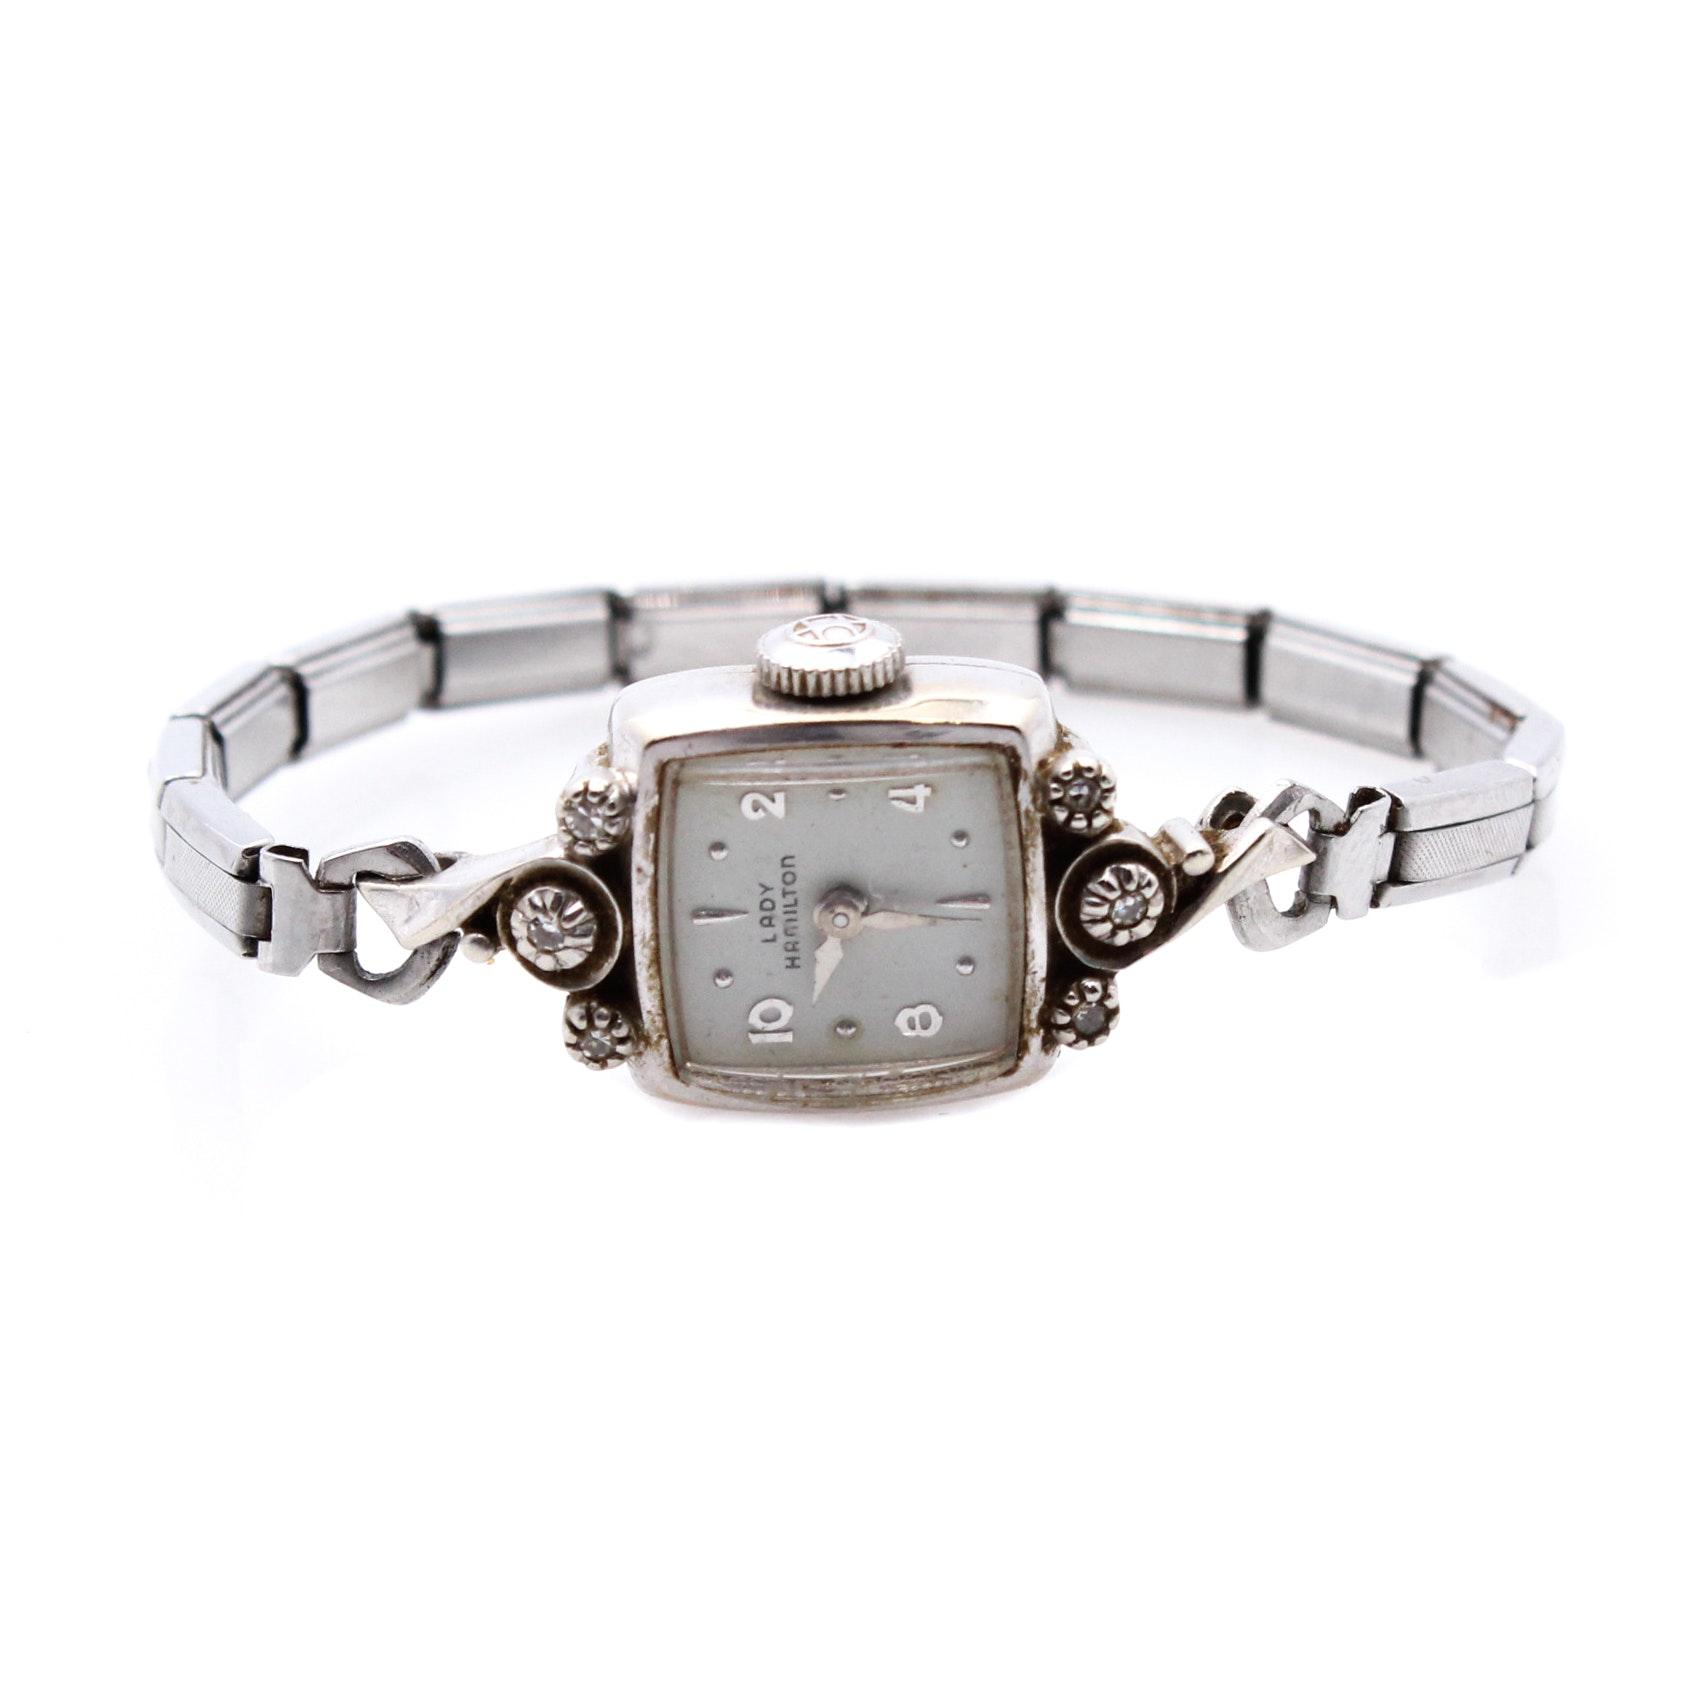 Lady Hamilton 14K White Gold Watch with Diamonds